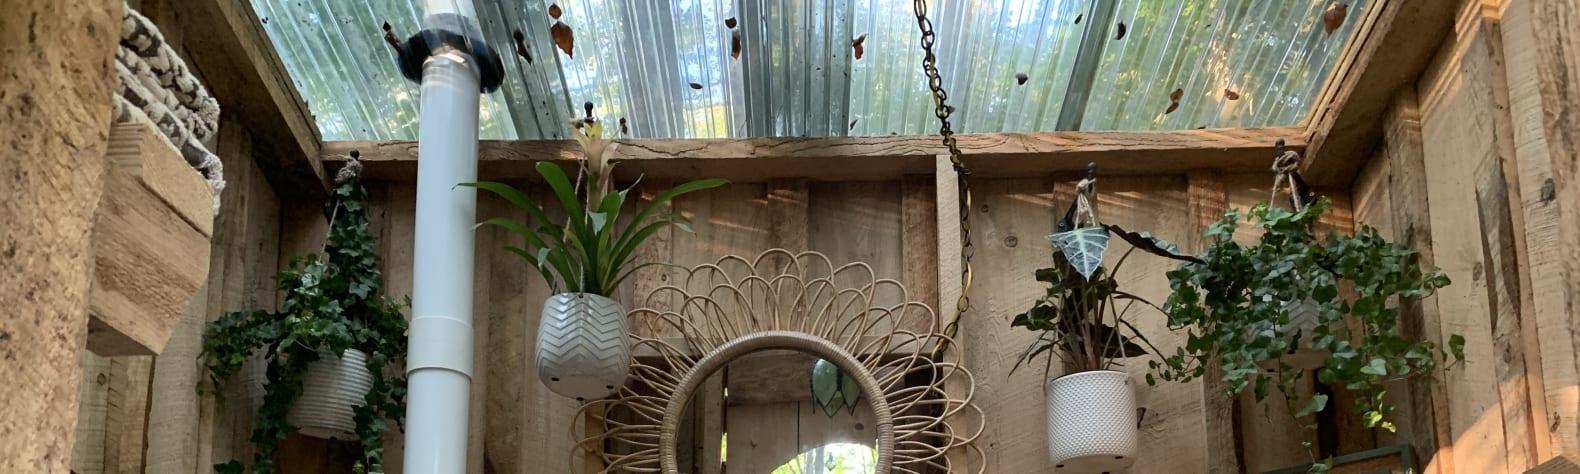 The Greenhouse Getaway